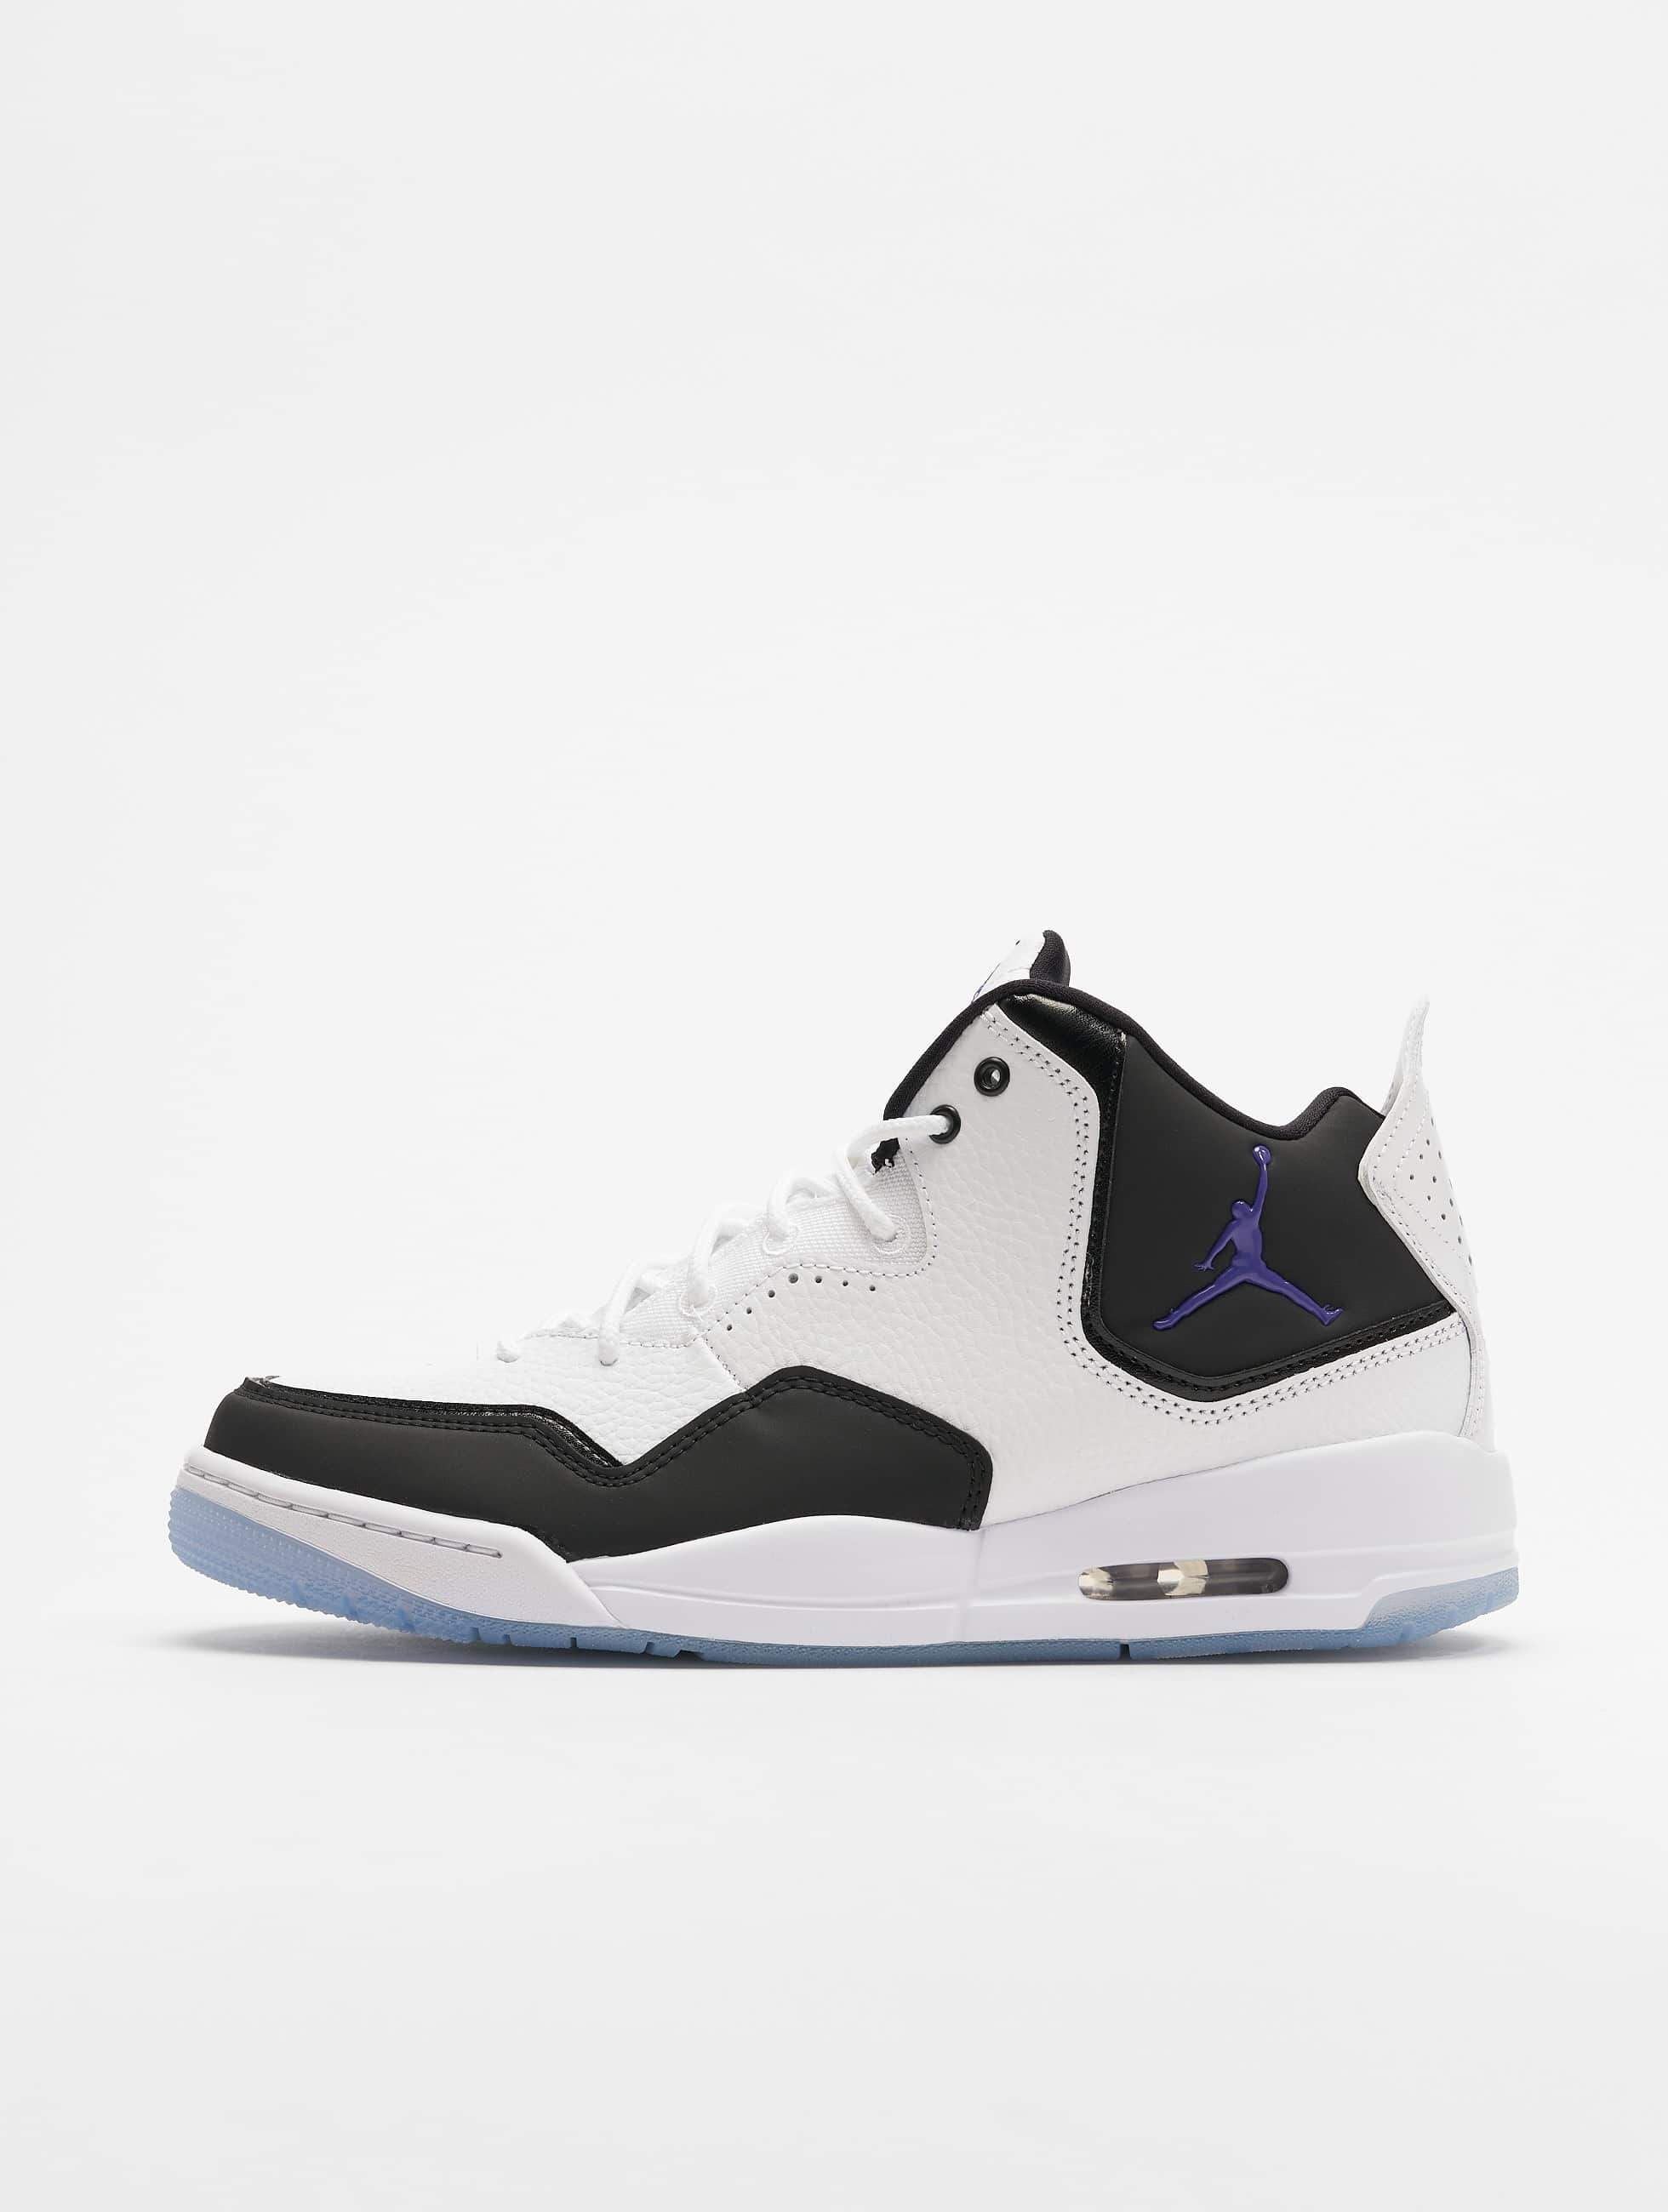 Jordan Courtside 23 Whitedark Concord Black Sneakers qSVUzpM